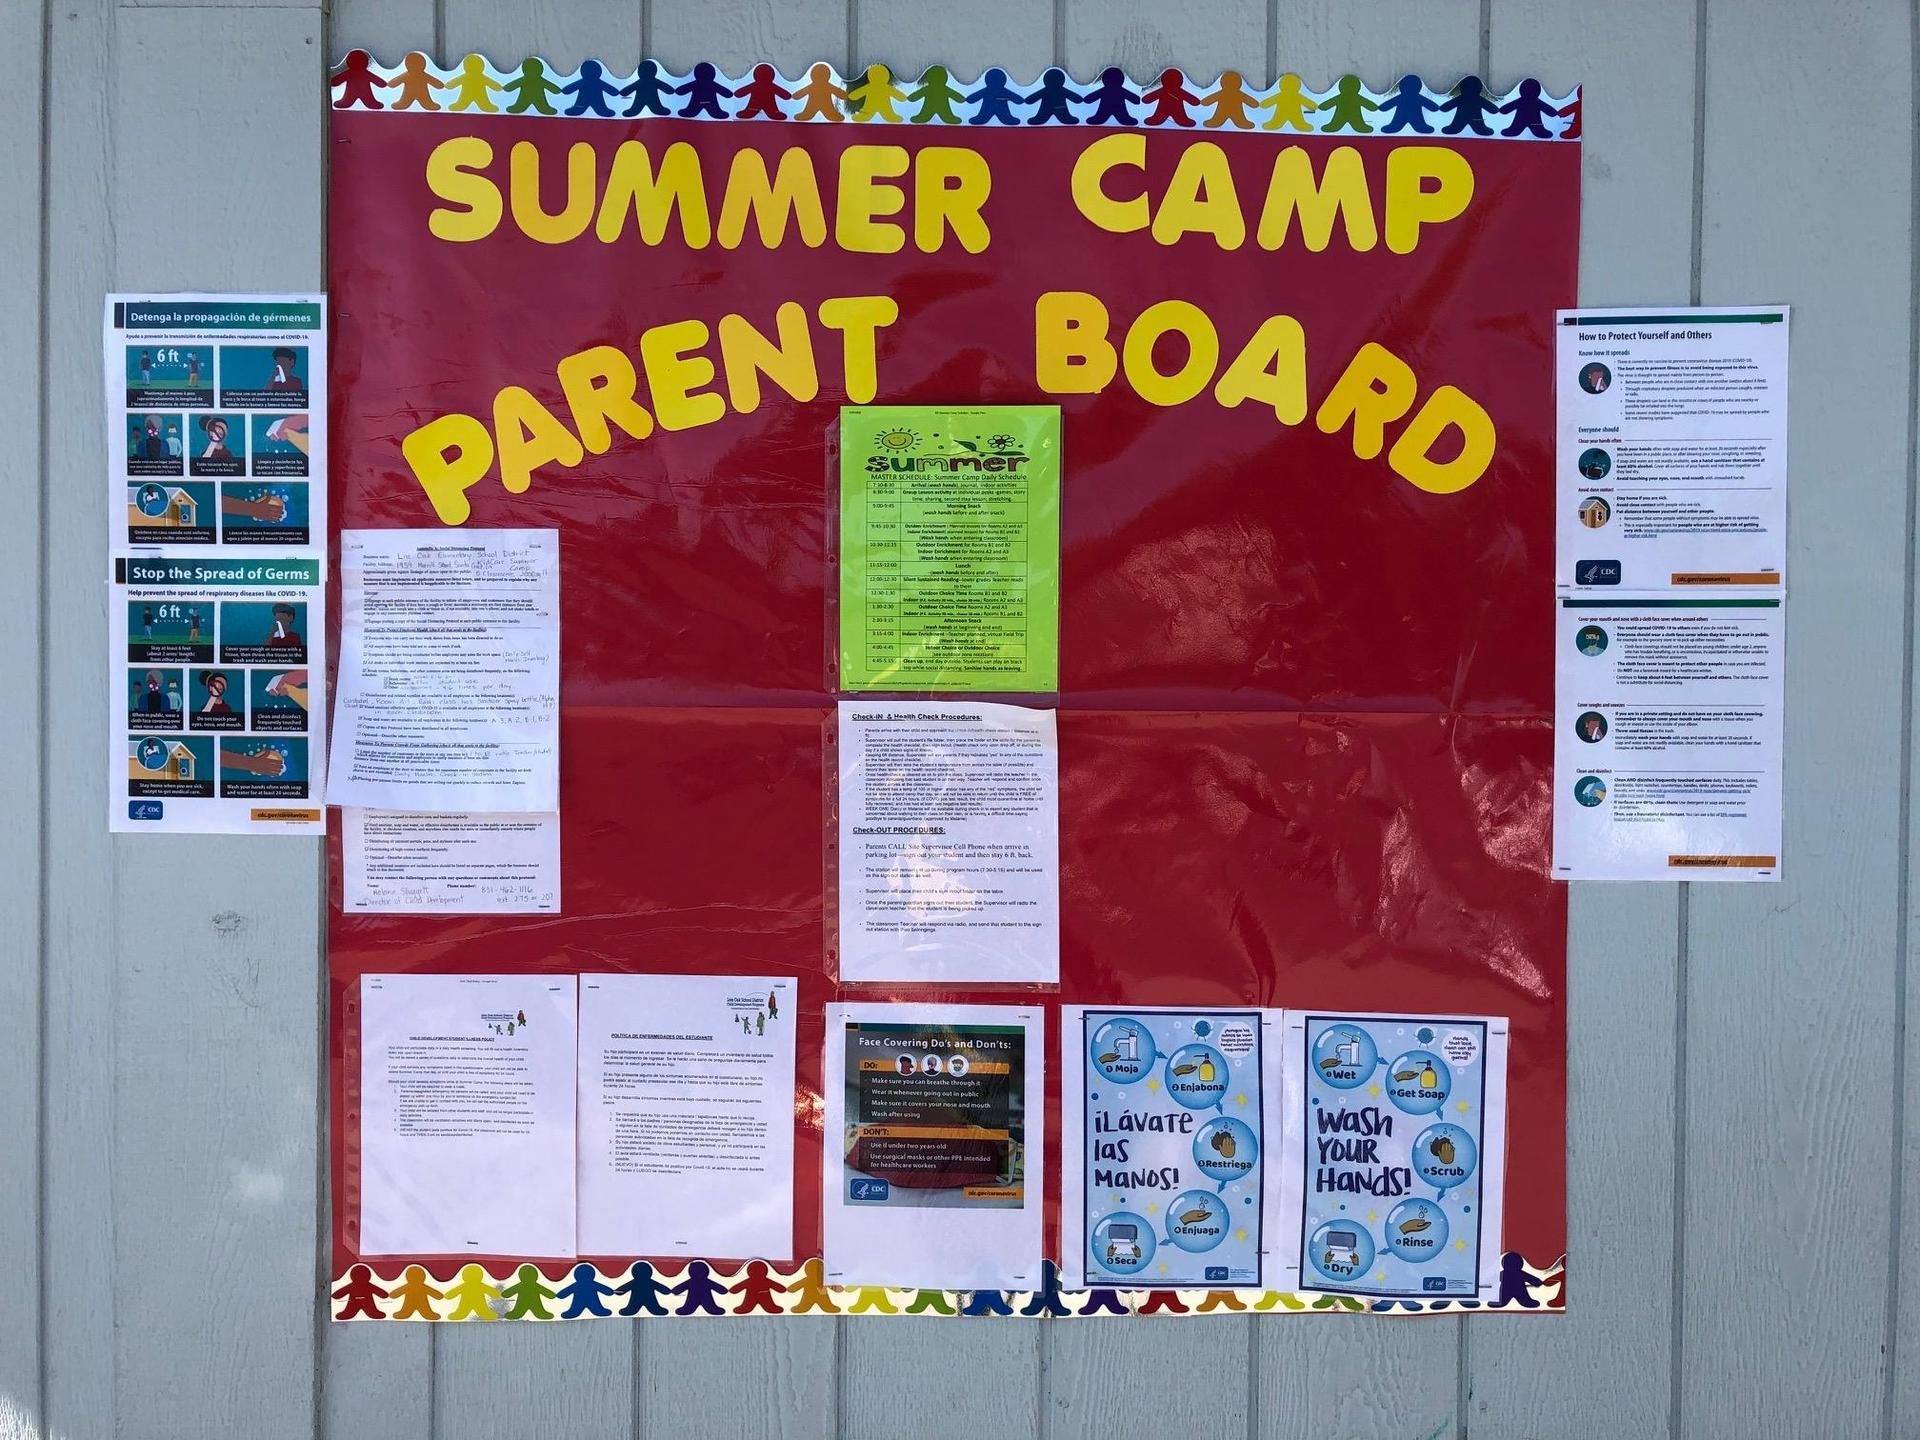 Parent Board